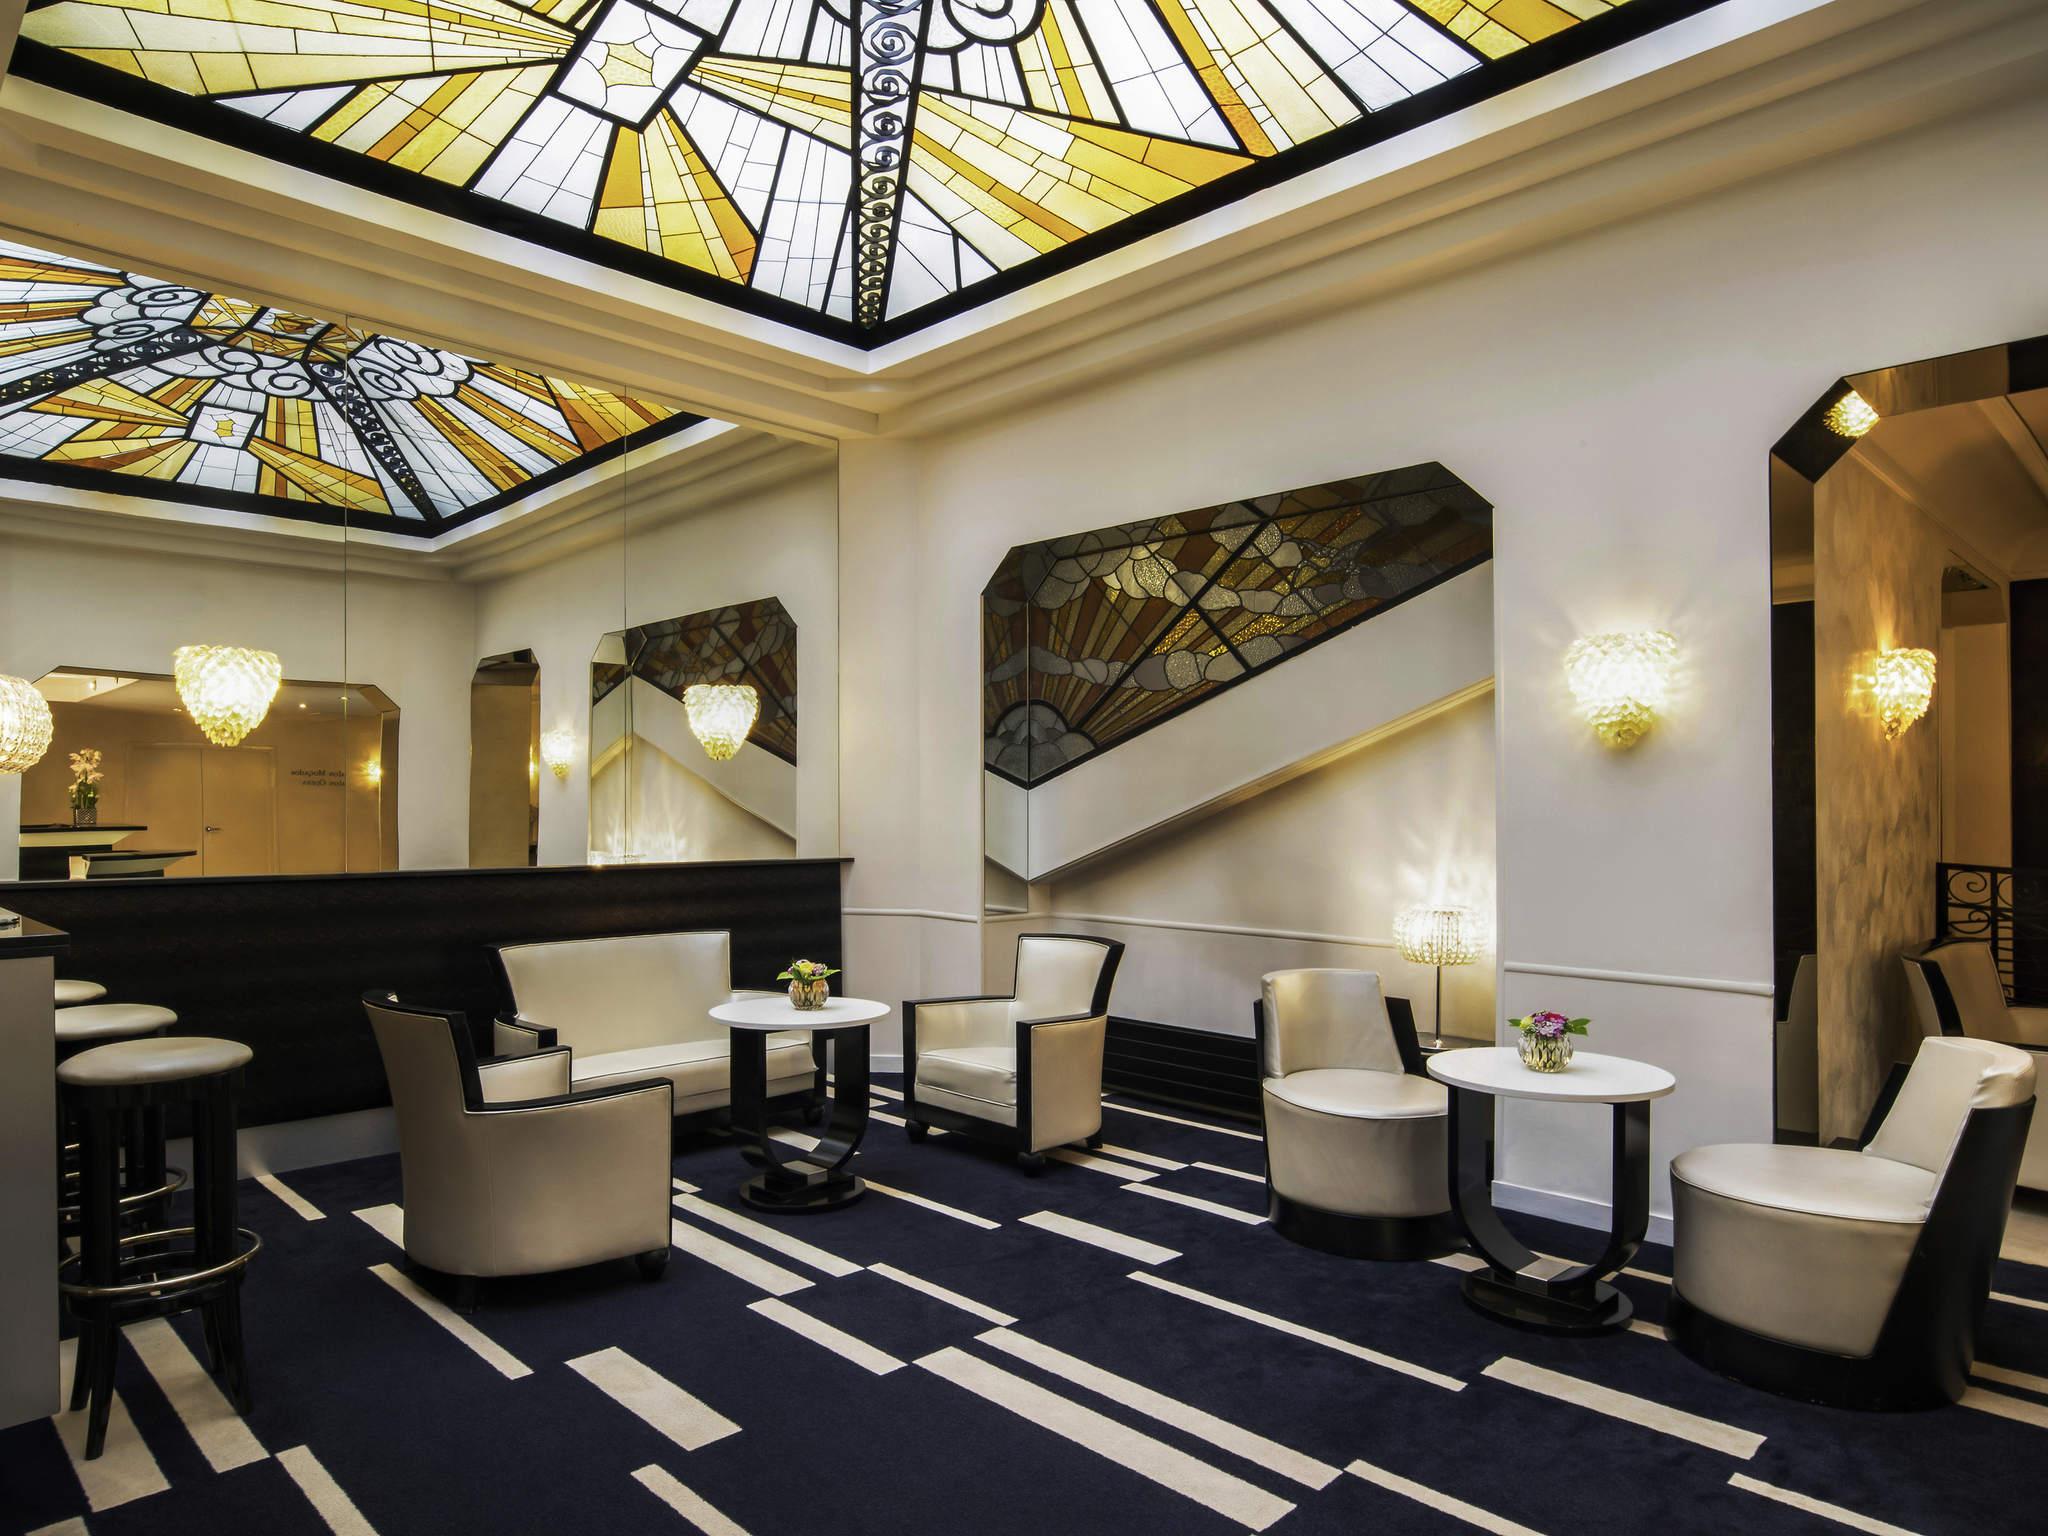 فندق - فندق مركيور Mercure باريس أوبرا فوبور مونمارتر